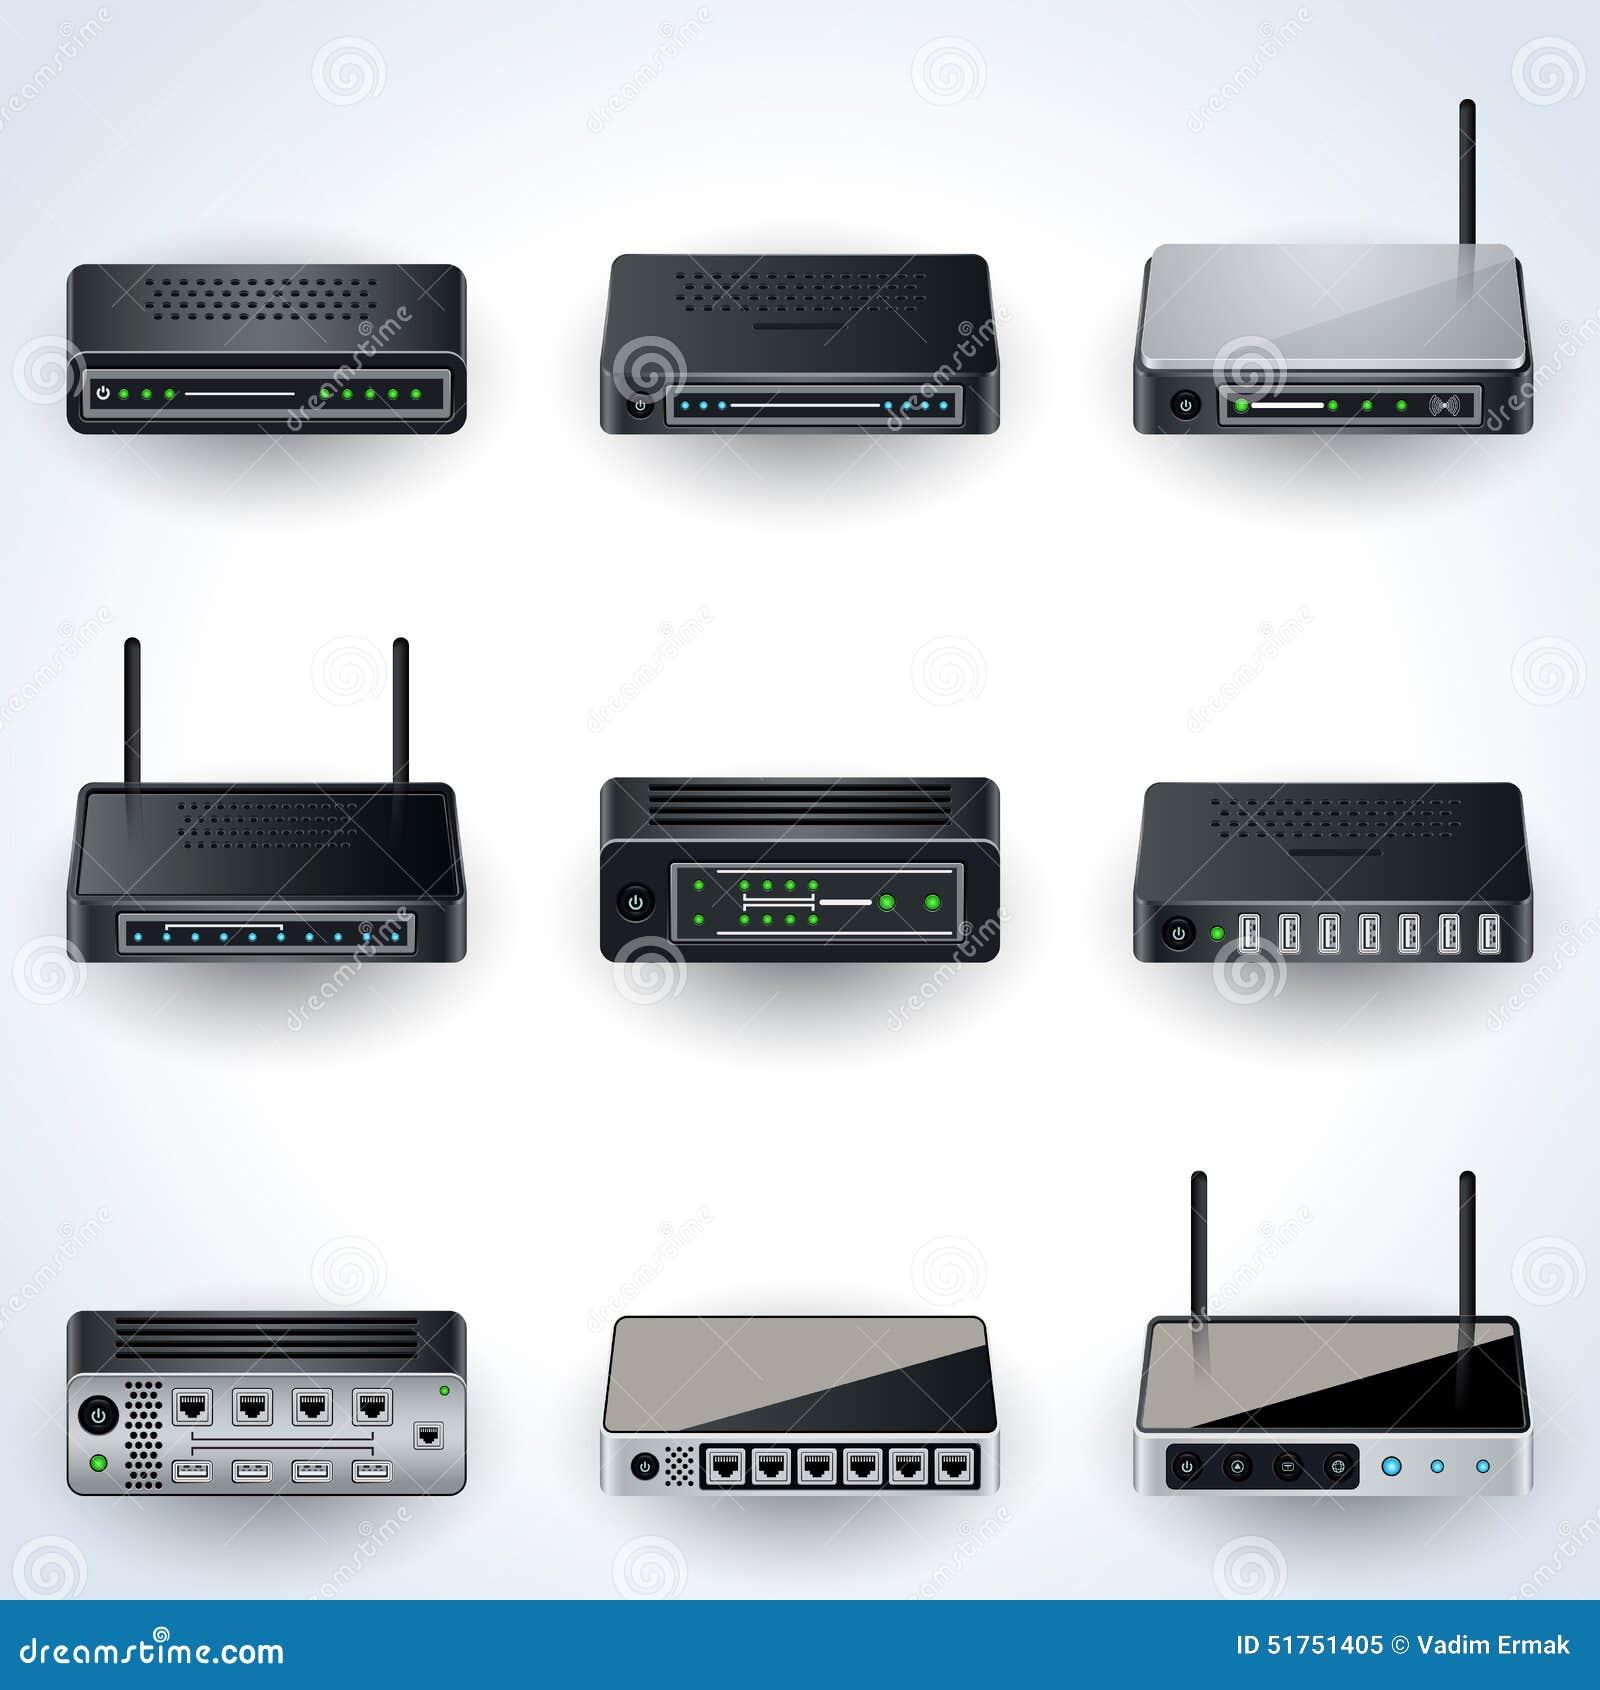 Network Equipment Icons : Network equipment icons stock vector illustration of